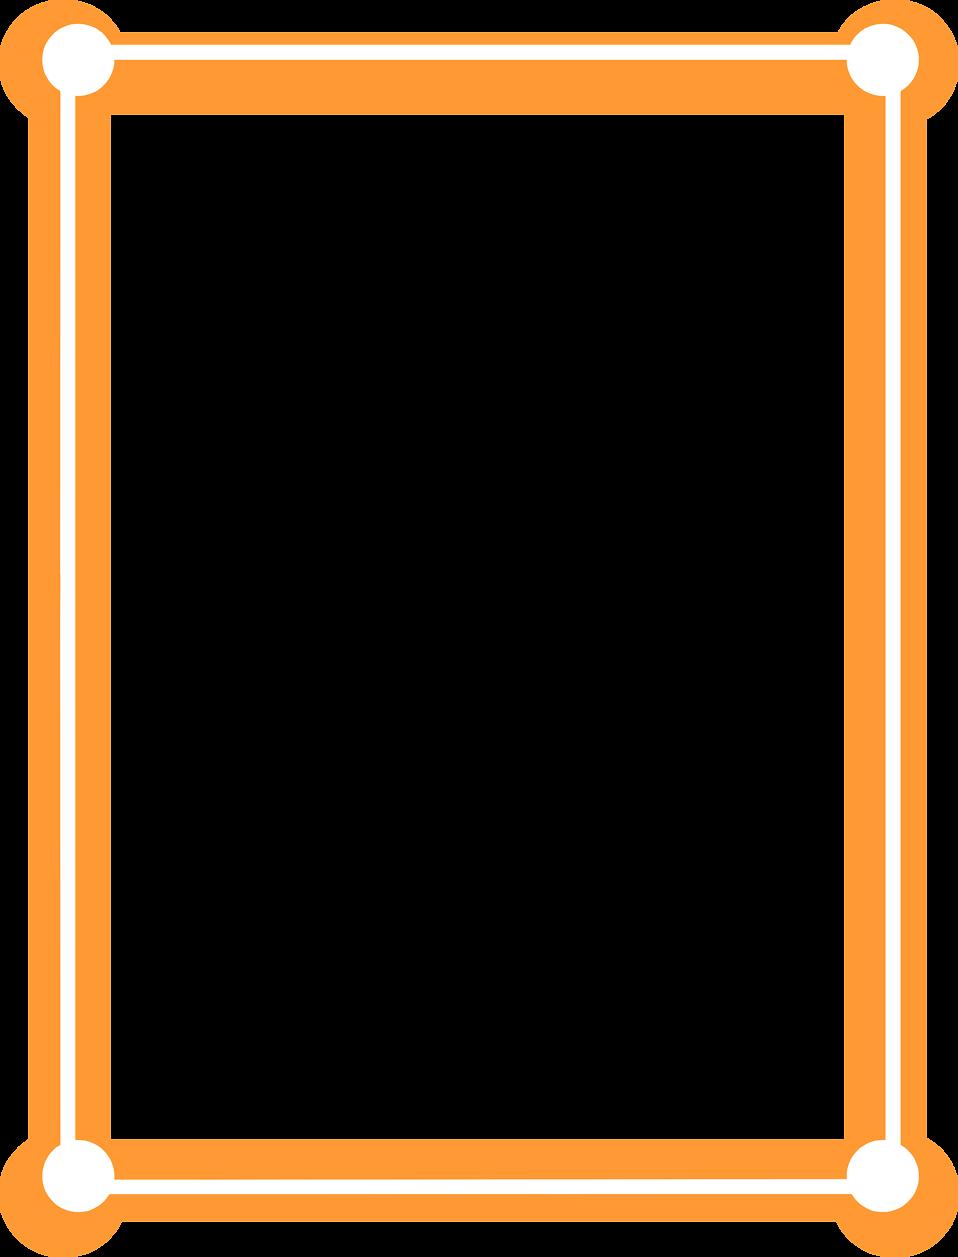 Orange flower border clipart jpg black and white library Orange Border Frame PNG Picture | PNG Mart jpg black and white library